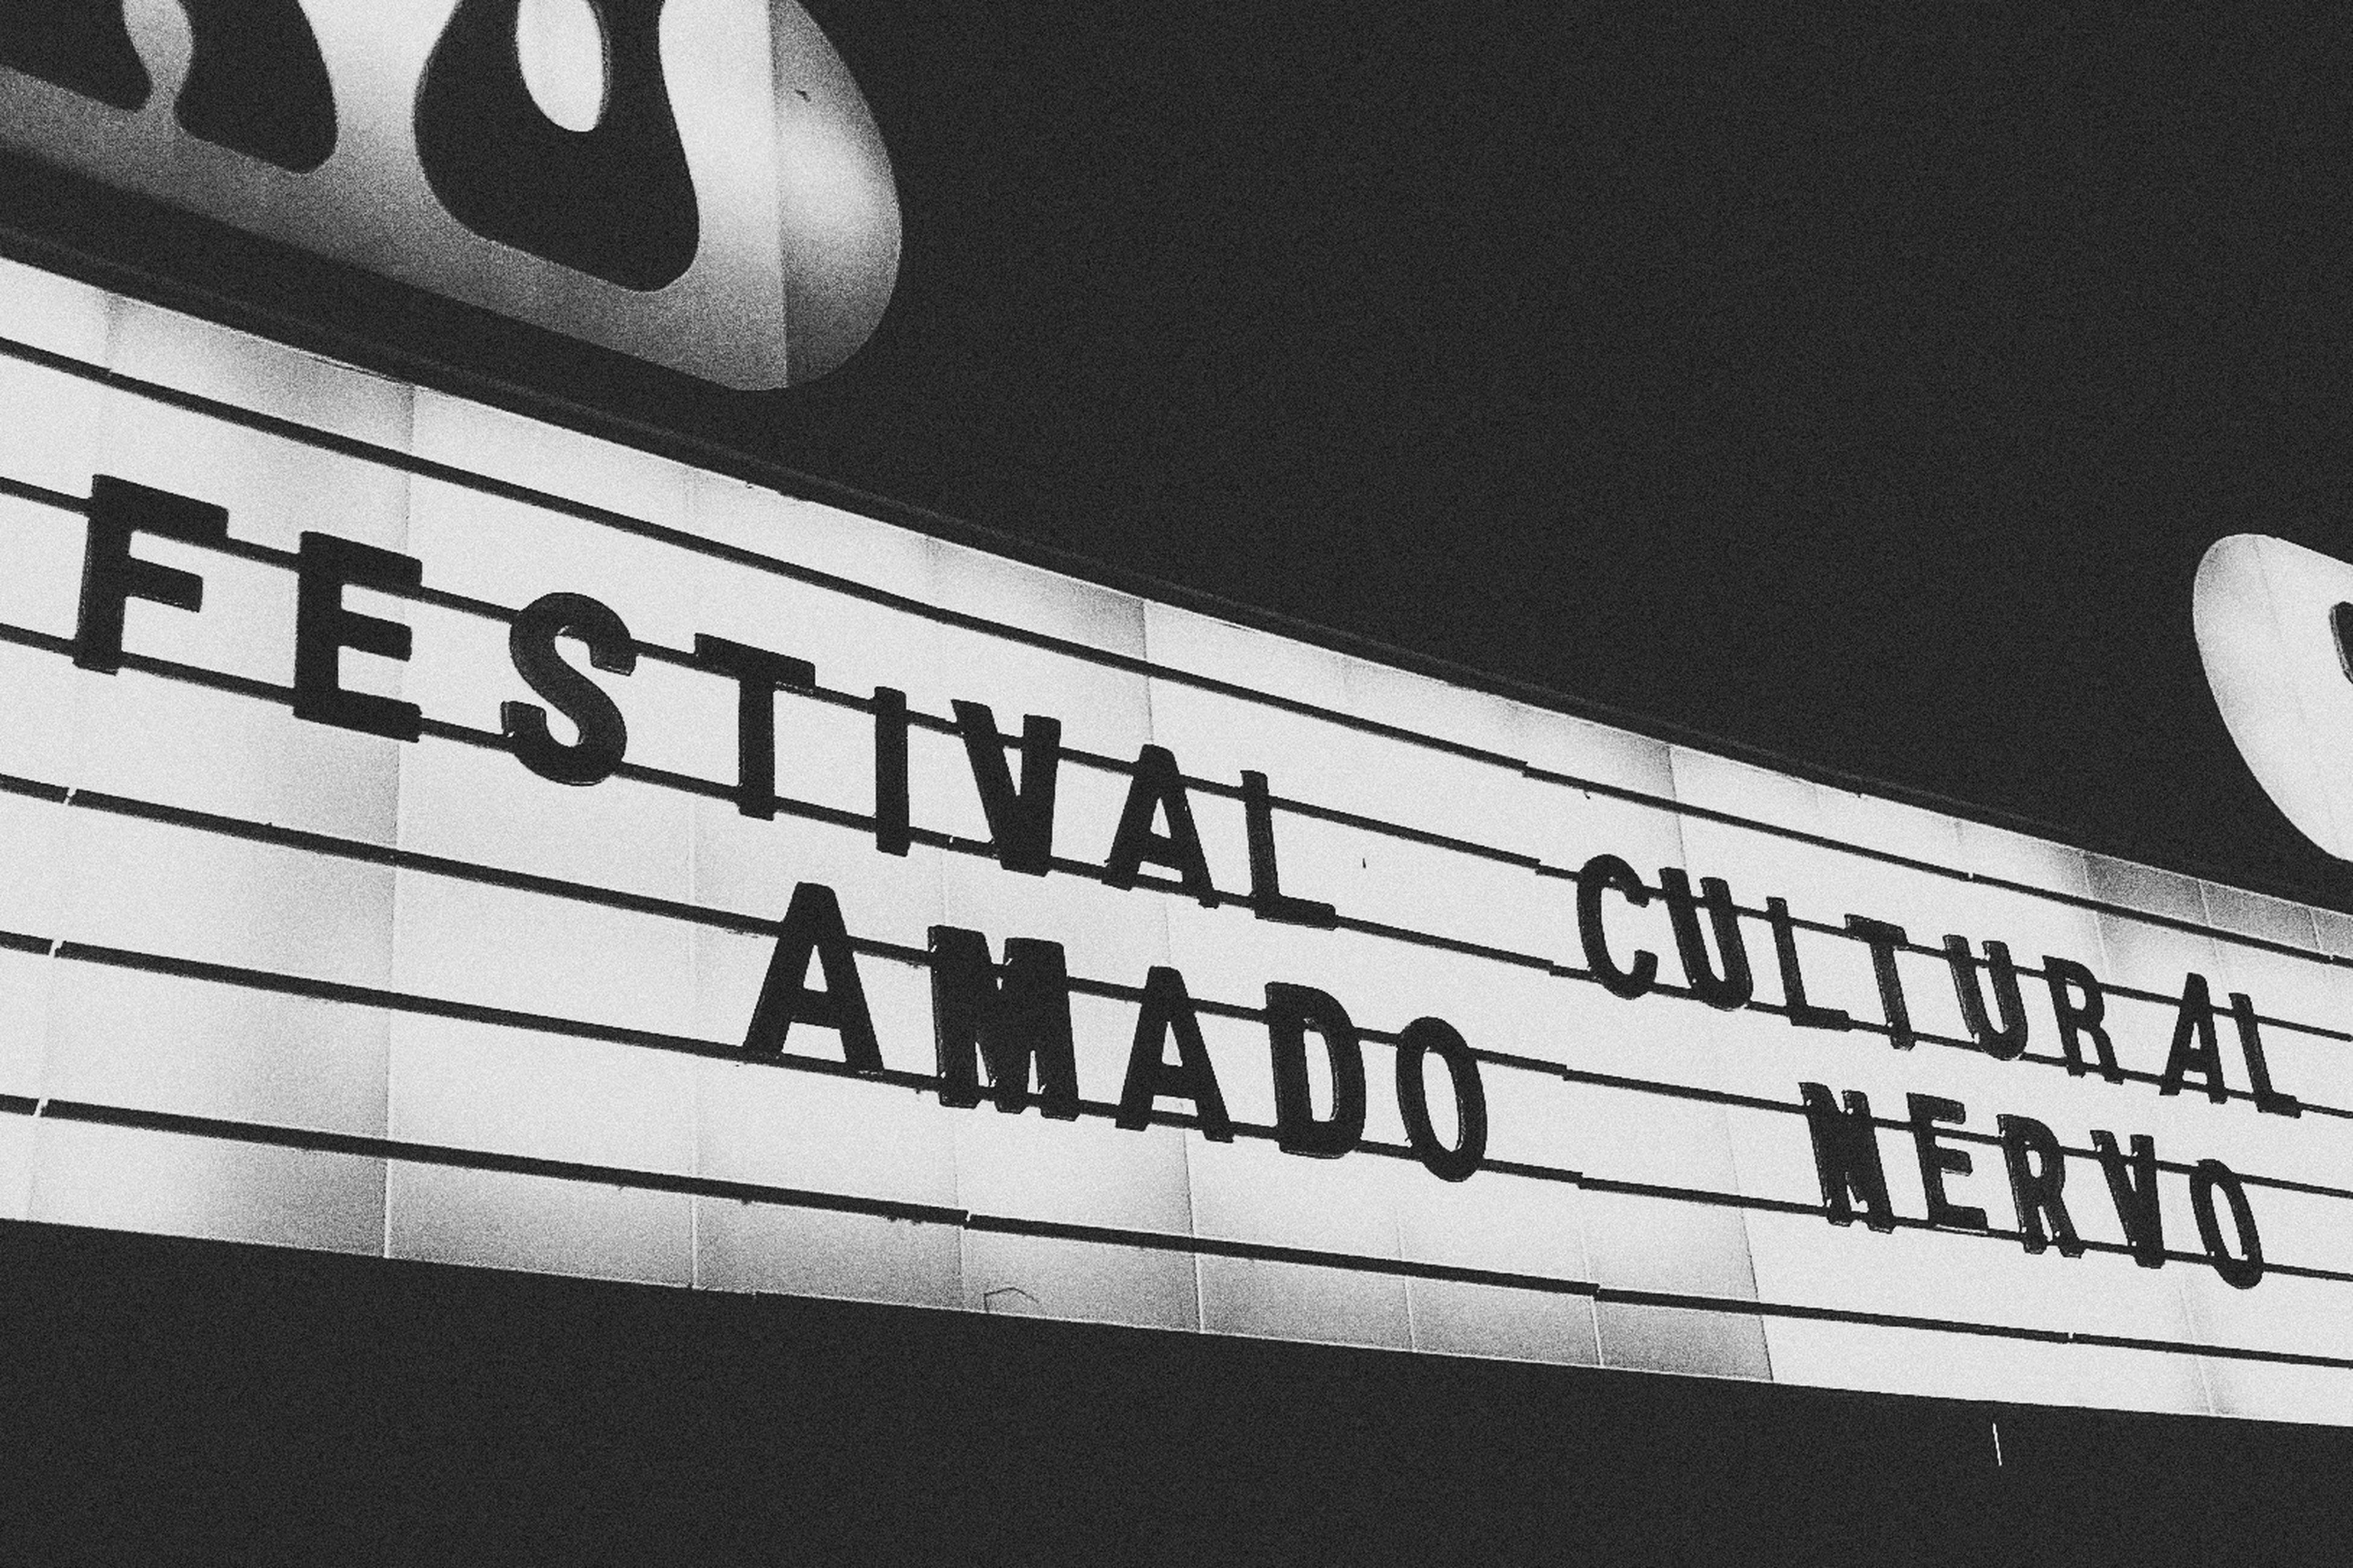 Festival Cultural Amado Nervo Nayarit 2014 YoVivoElFestival